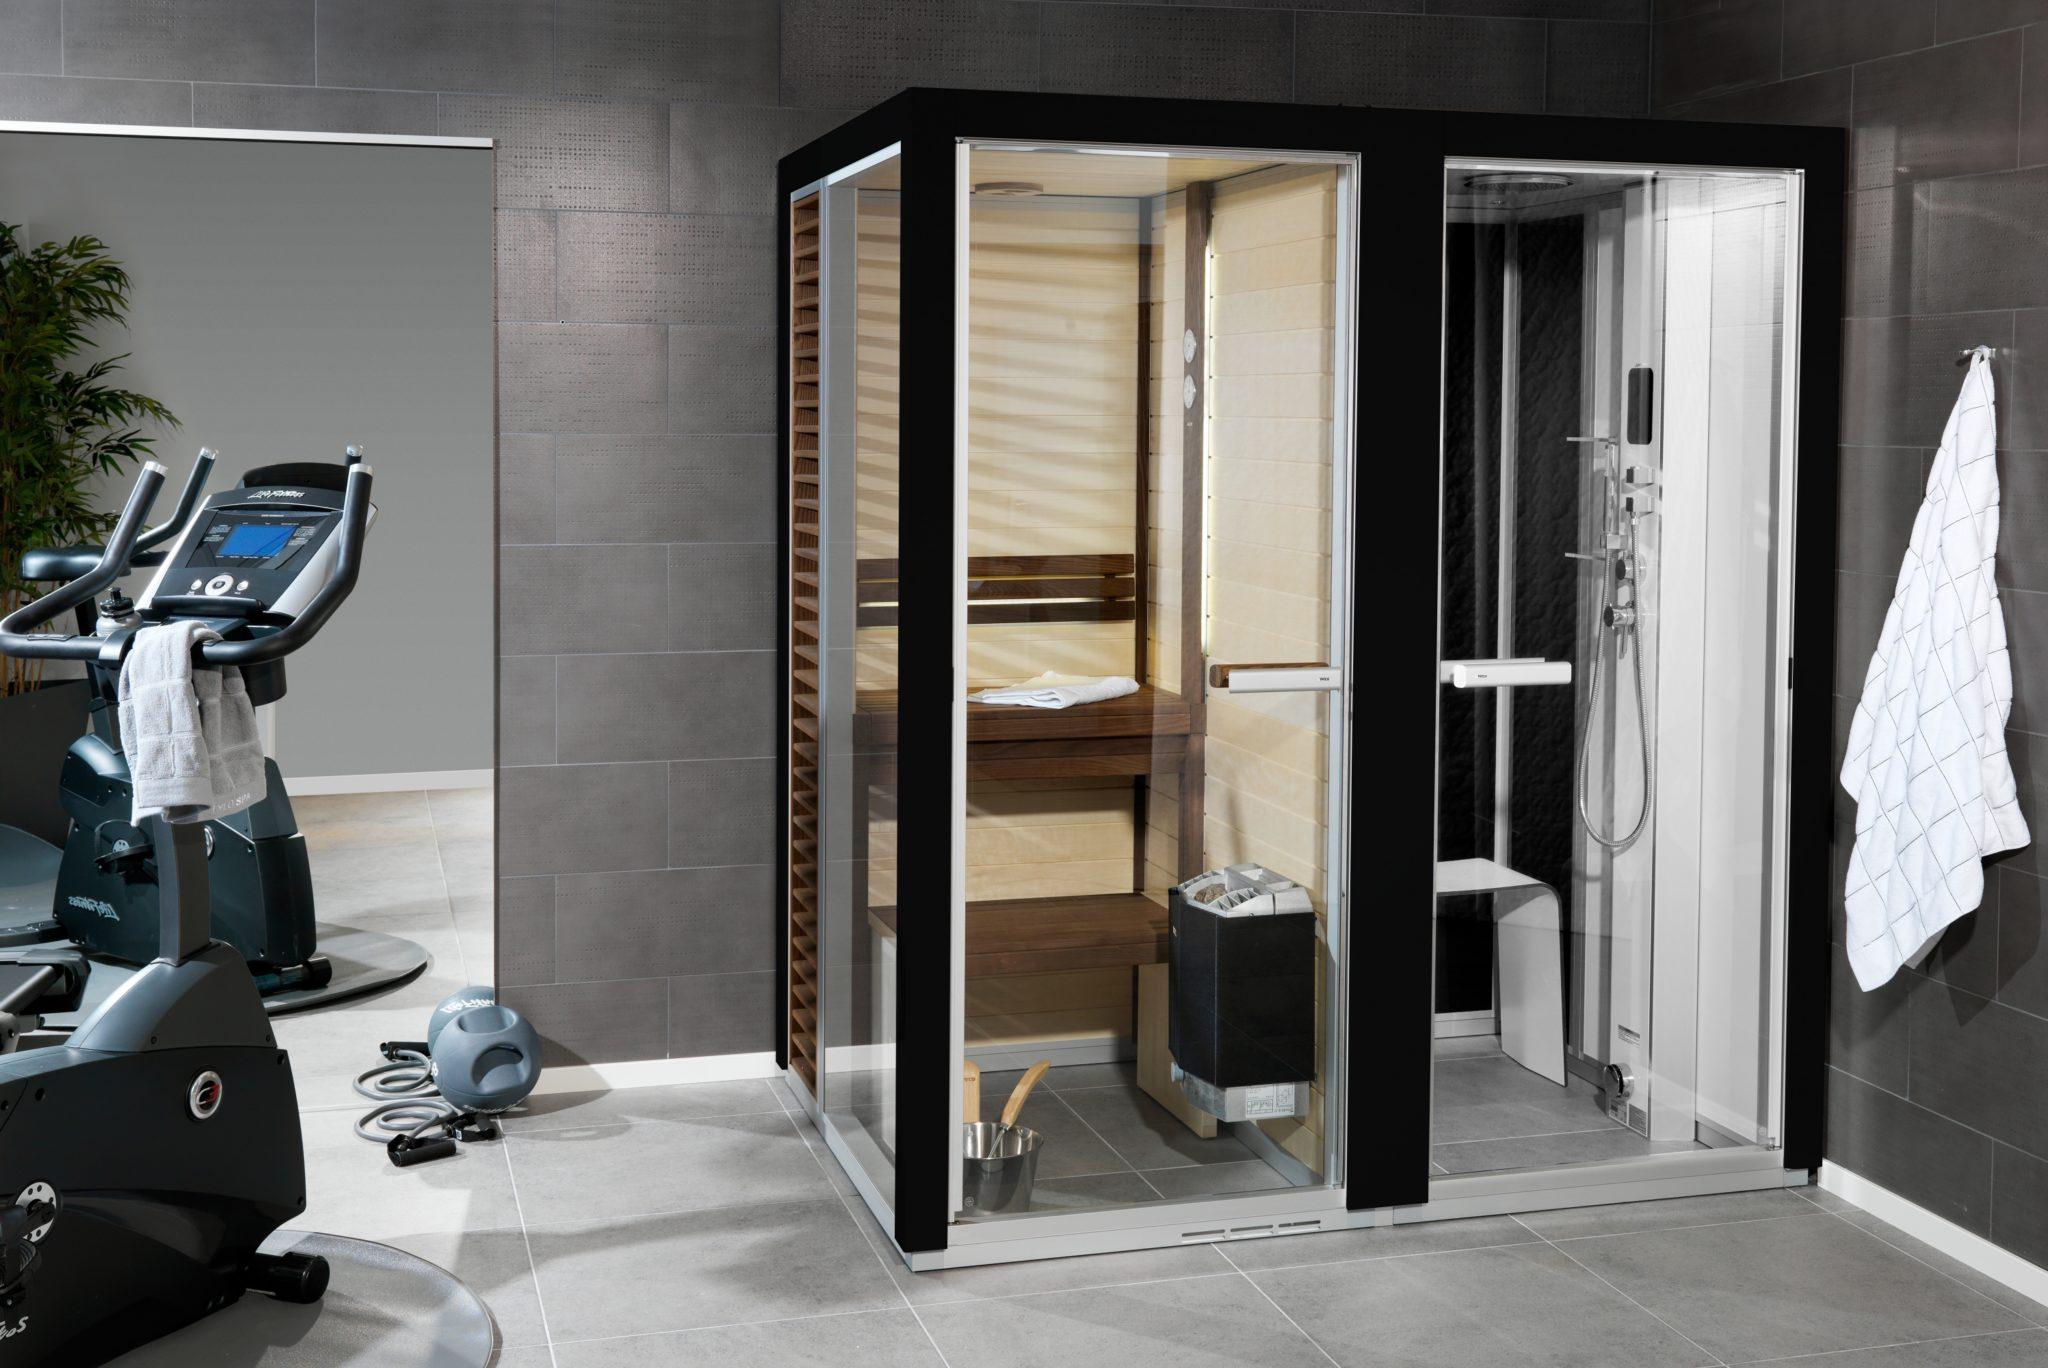 Choisissez-vous un soft sauna, sauna ou hammam ?